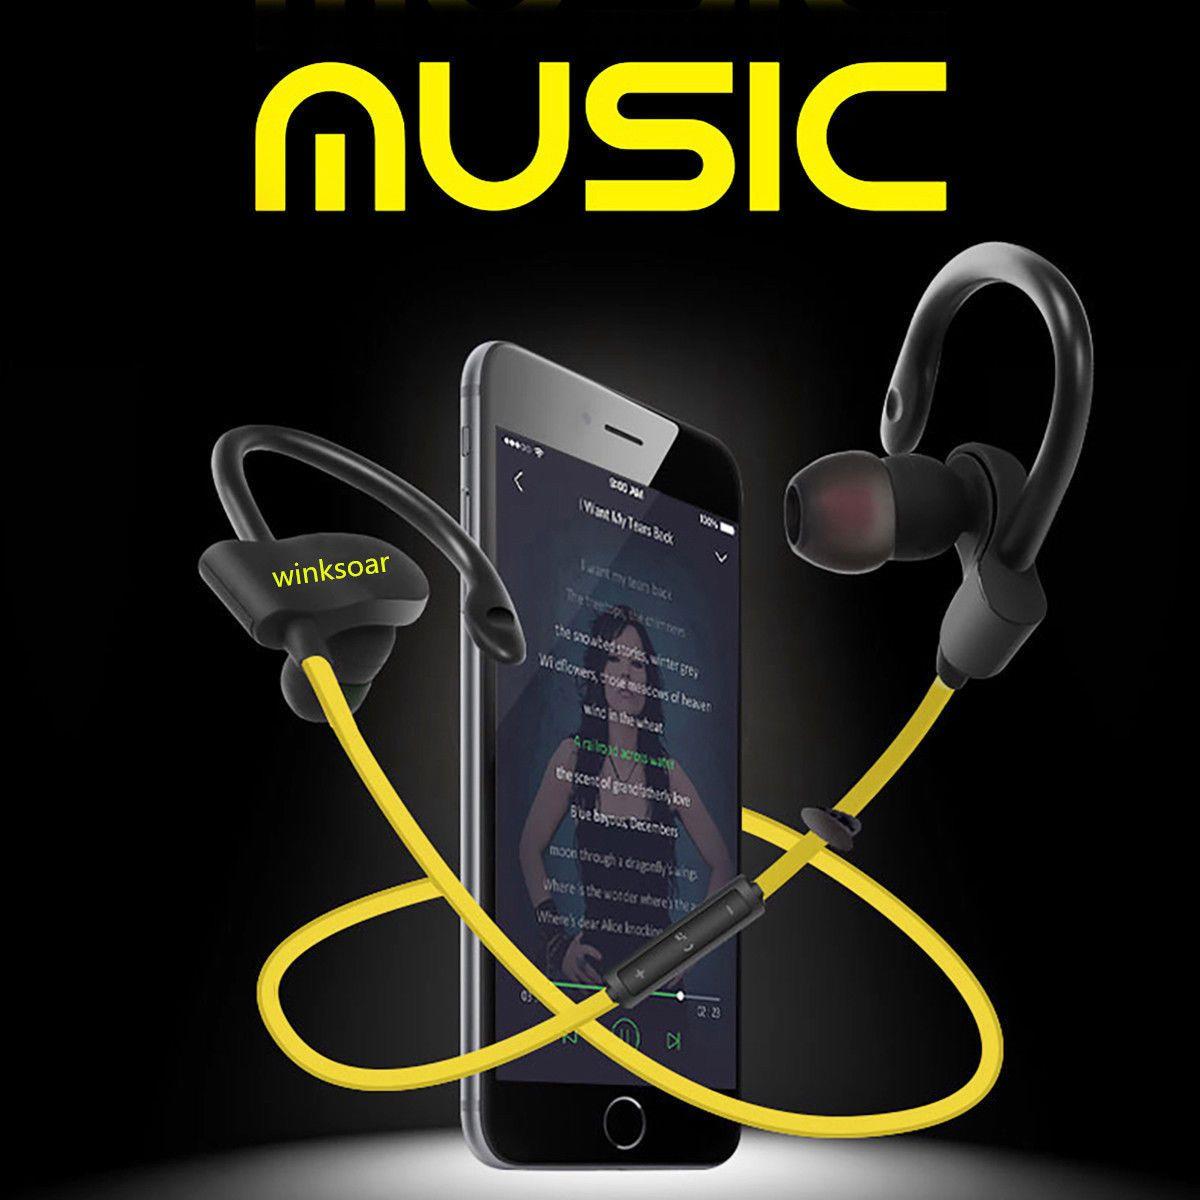 8 28 Wireless Bluetooth 4 1 Headset Headphone Earphone Sport For Iphone Samsung Lg Ebay Electronics